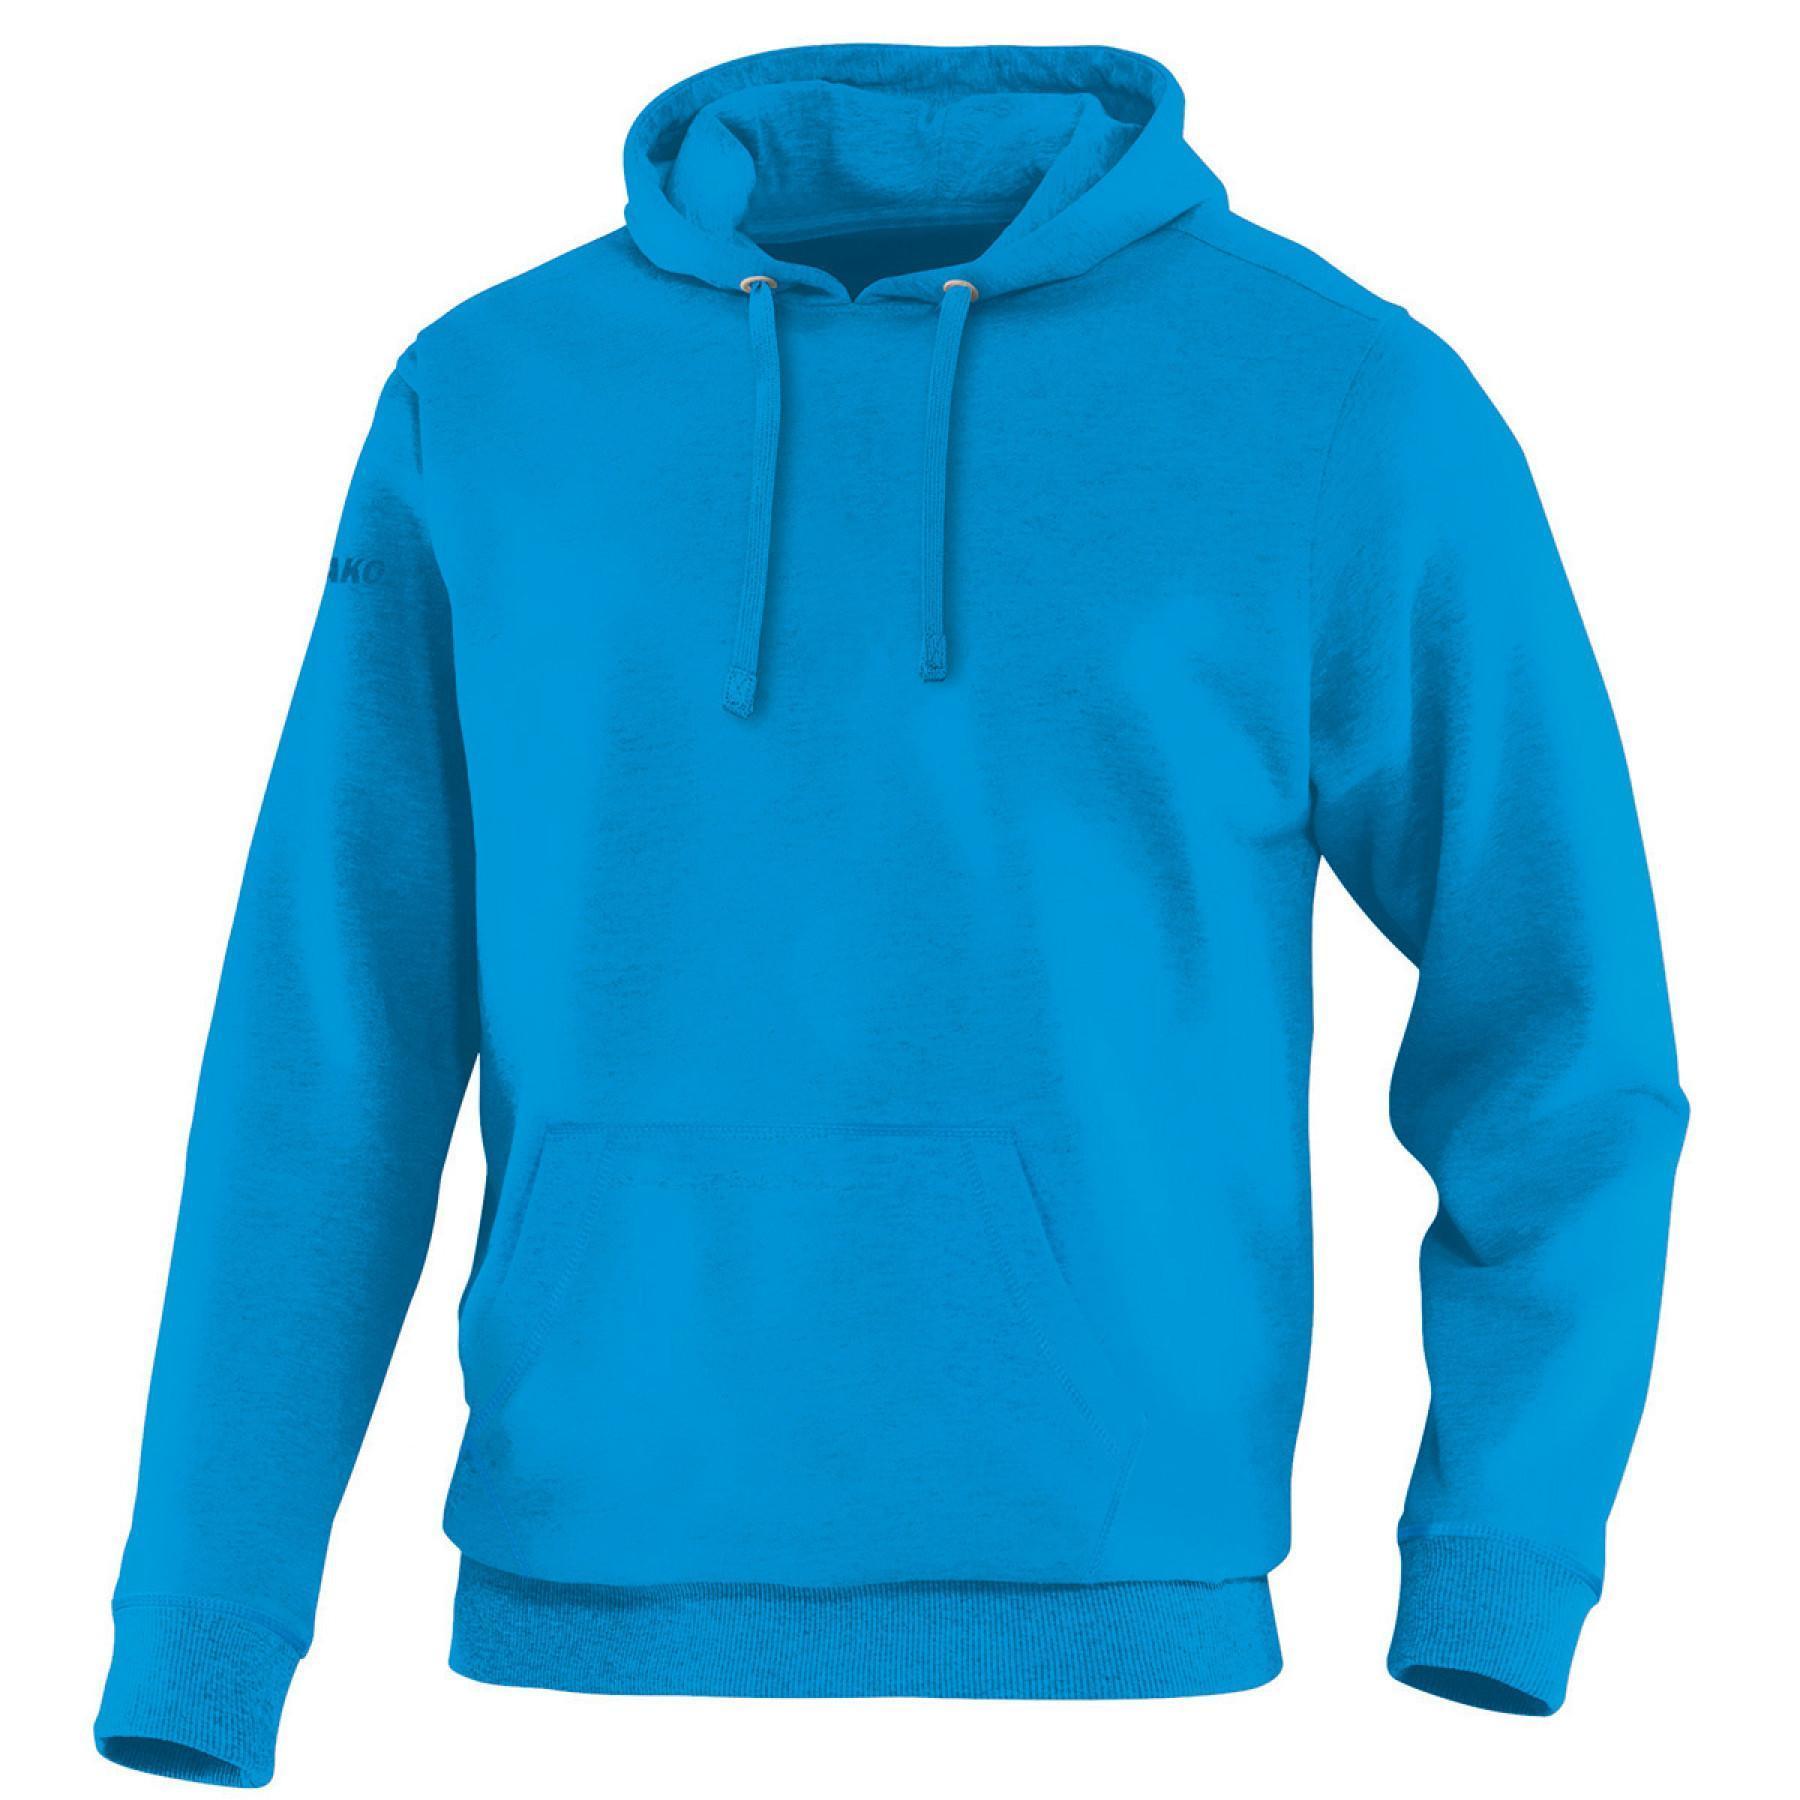 Junior Jako Sweatshirt hooded Team